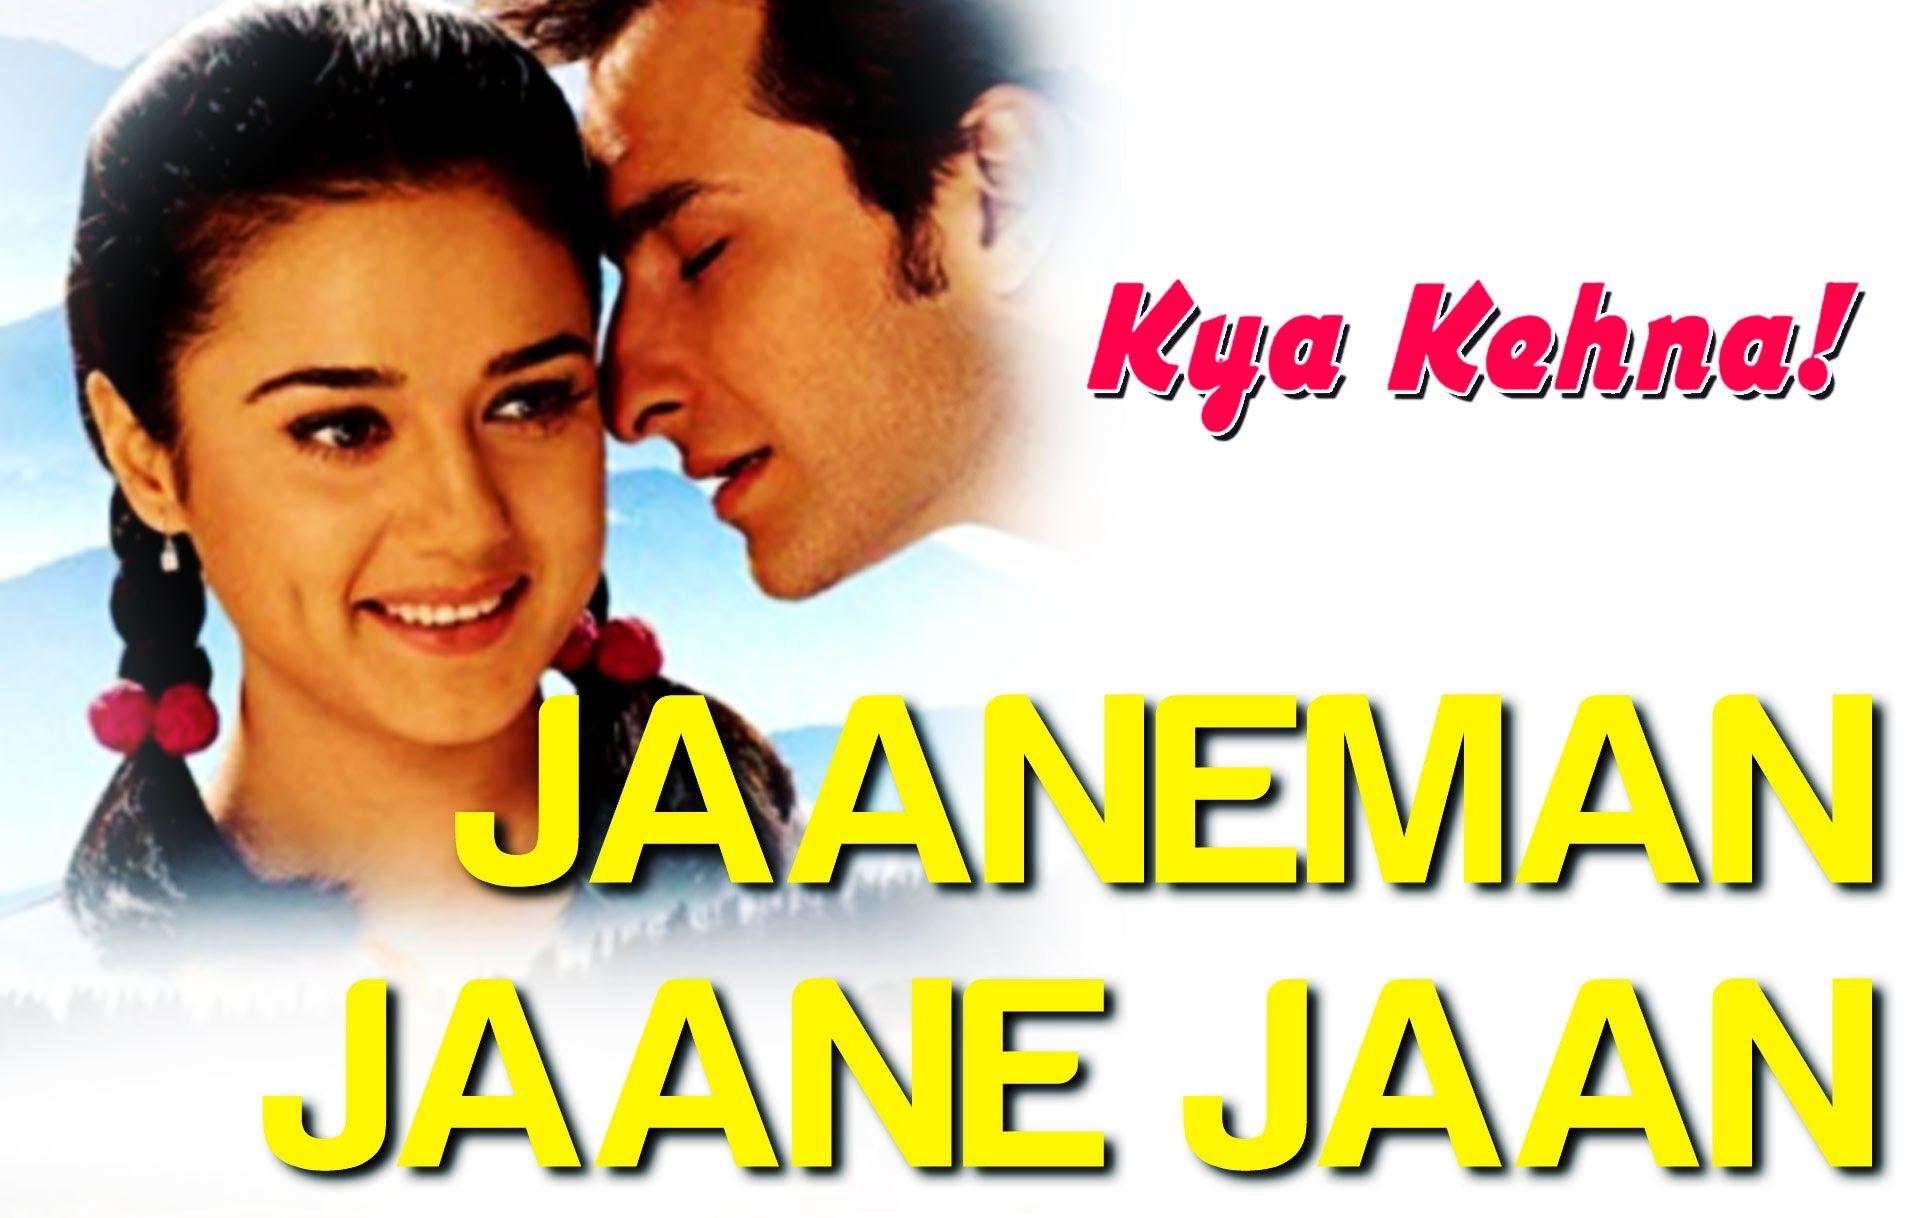 Jaaneman Jaane Jaan Kya Kehna Preity Zinta Saif Ali Khan Sonu Nigam Alka Yagnik Song Lyrics Songs Lyrics